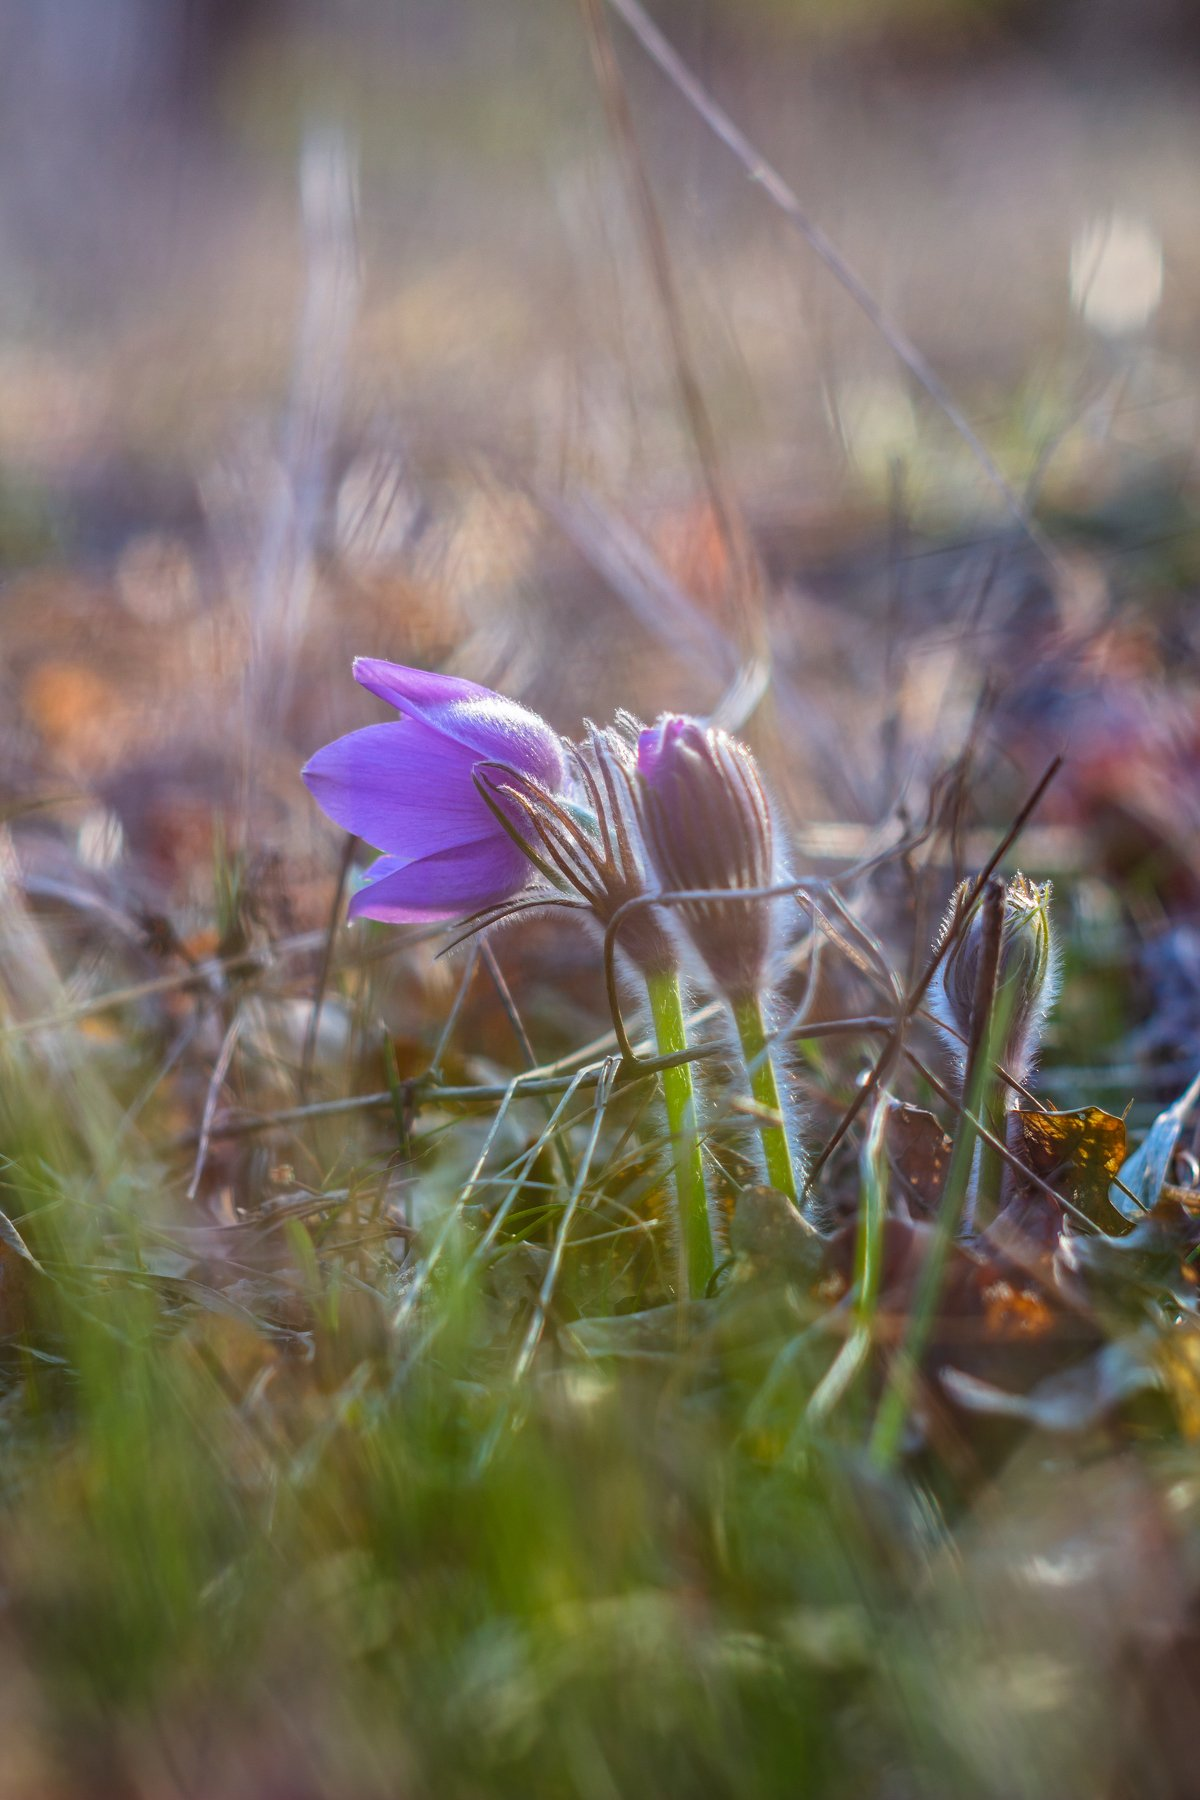 сон-трава, первоцвет, лес, заповедник, весна, Востриков Руслан